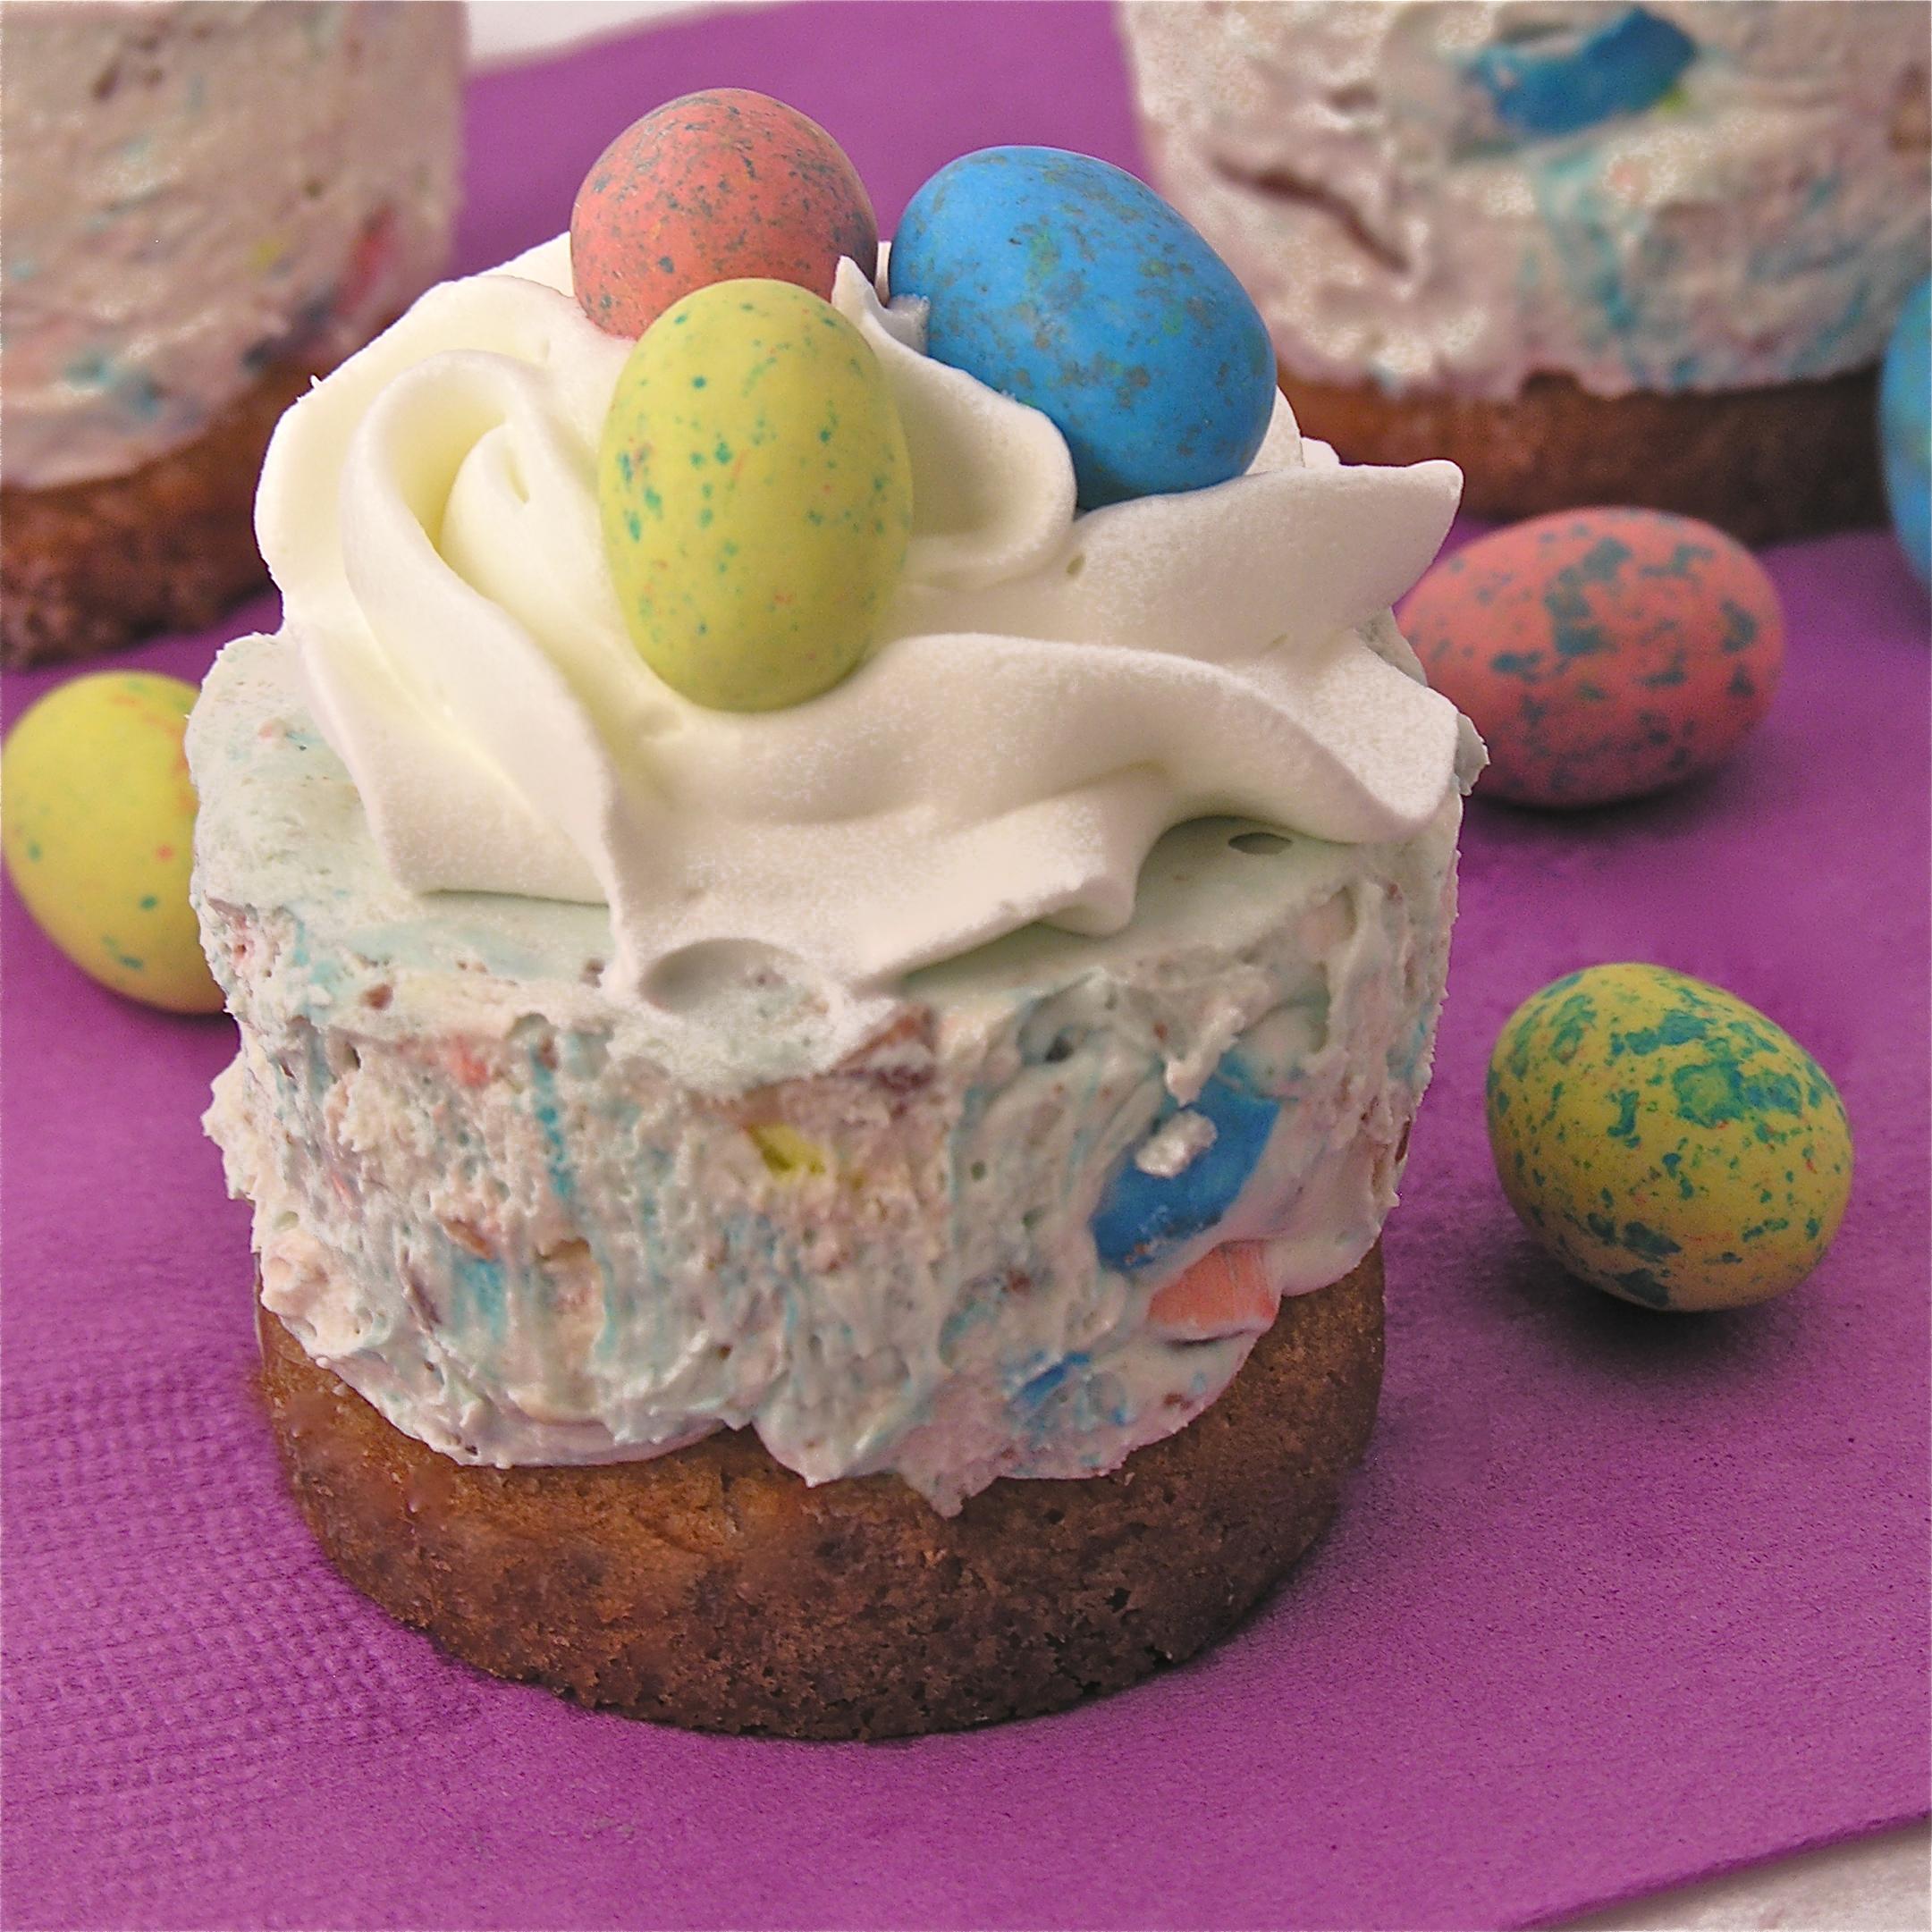 Easter Cheesecake Dessert Recipe